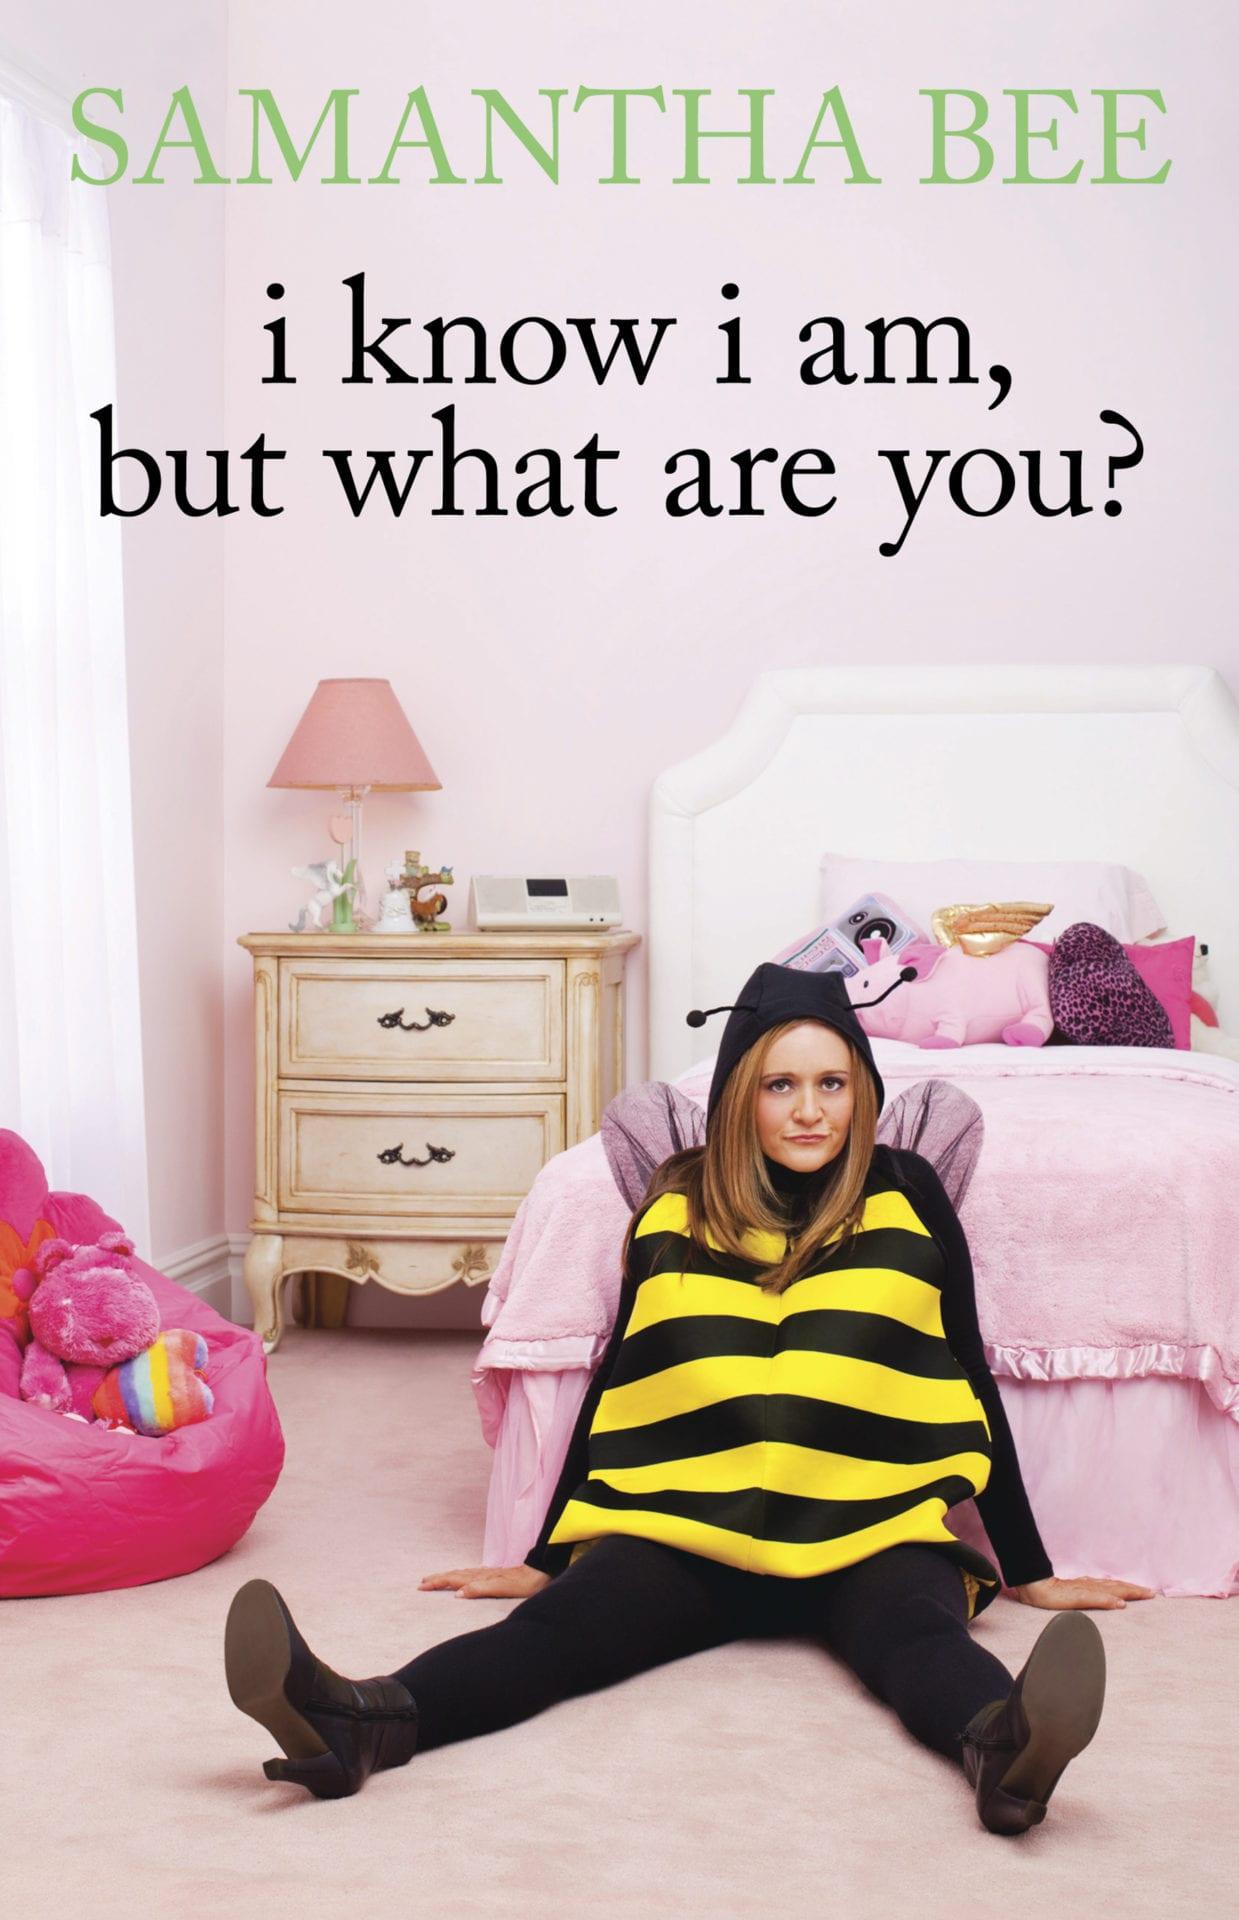 Samantha Bee